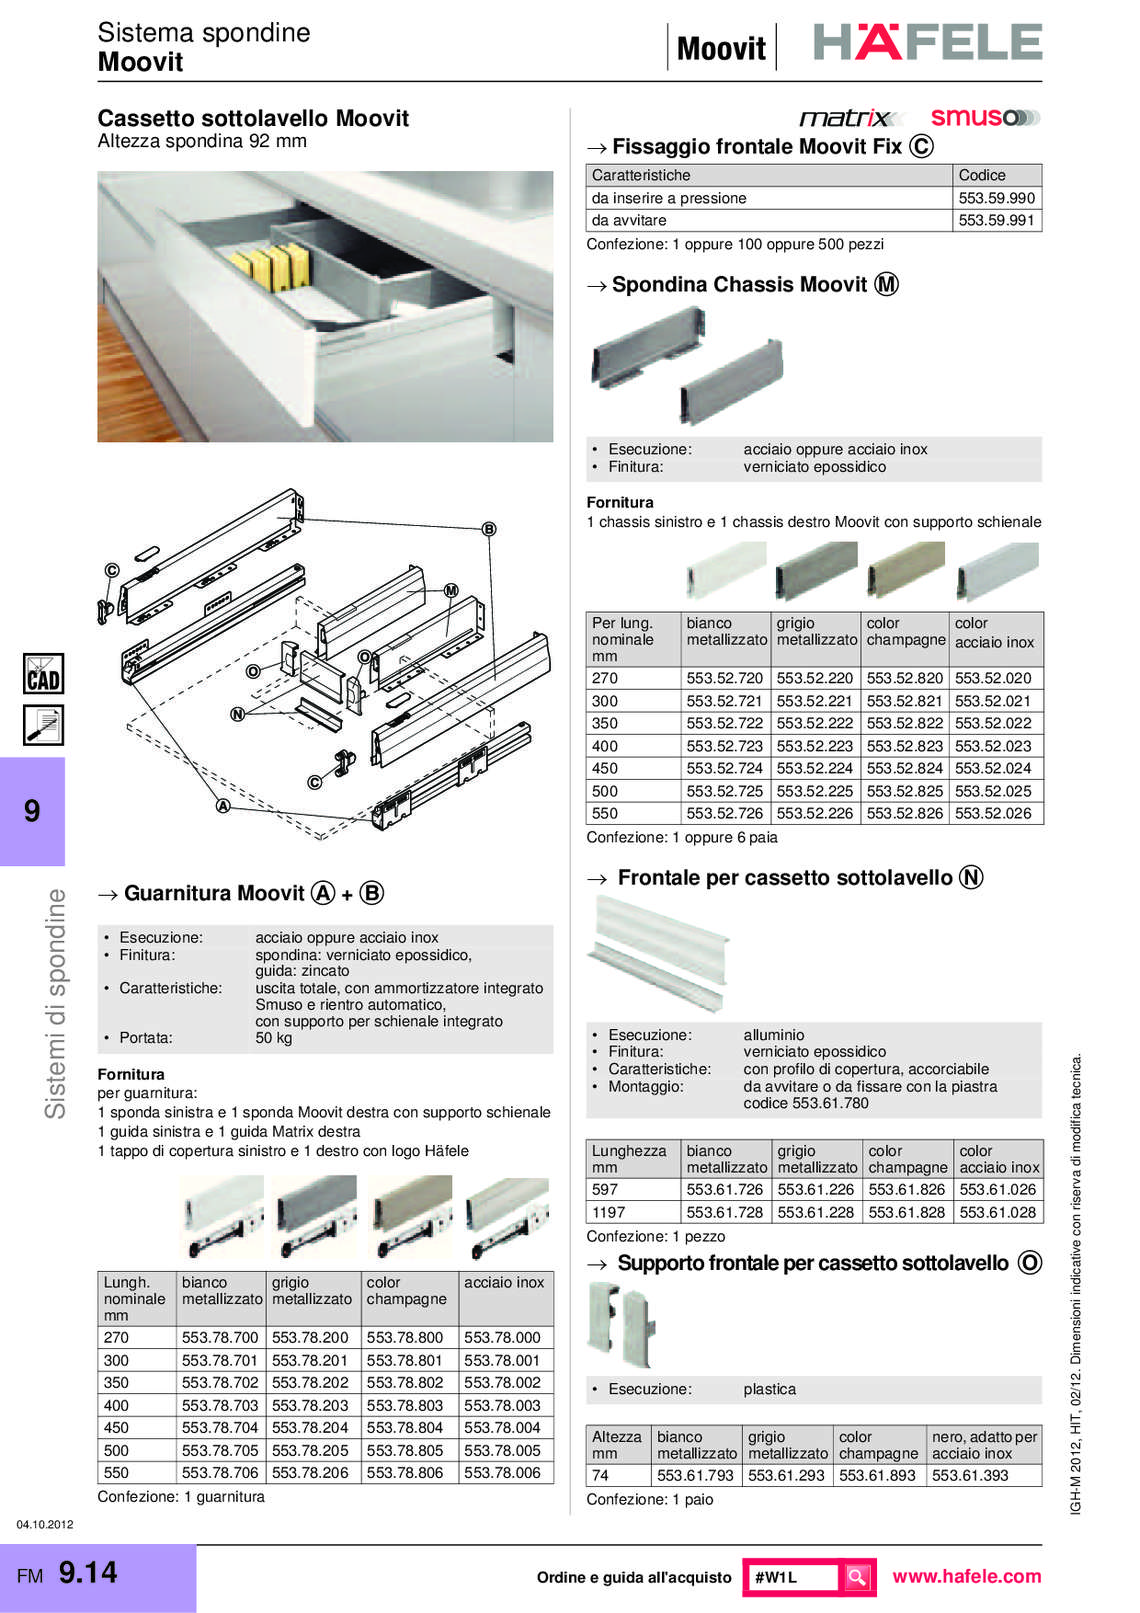 hafele-spondine-e-guide-per-mobili_40_027.jpg